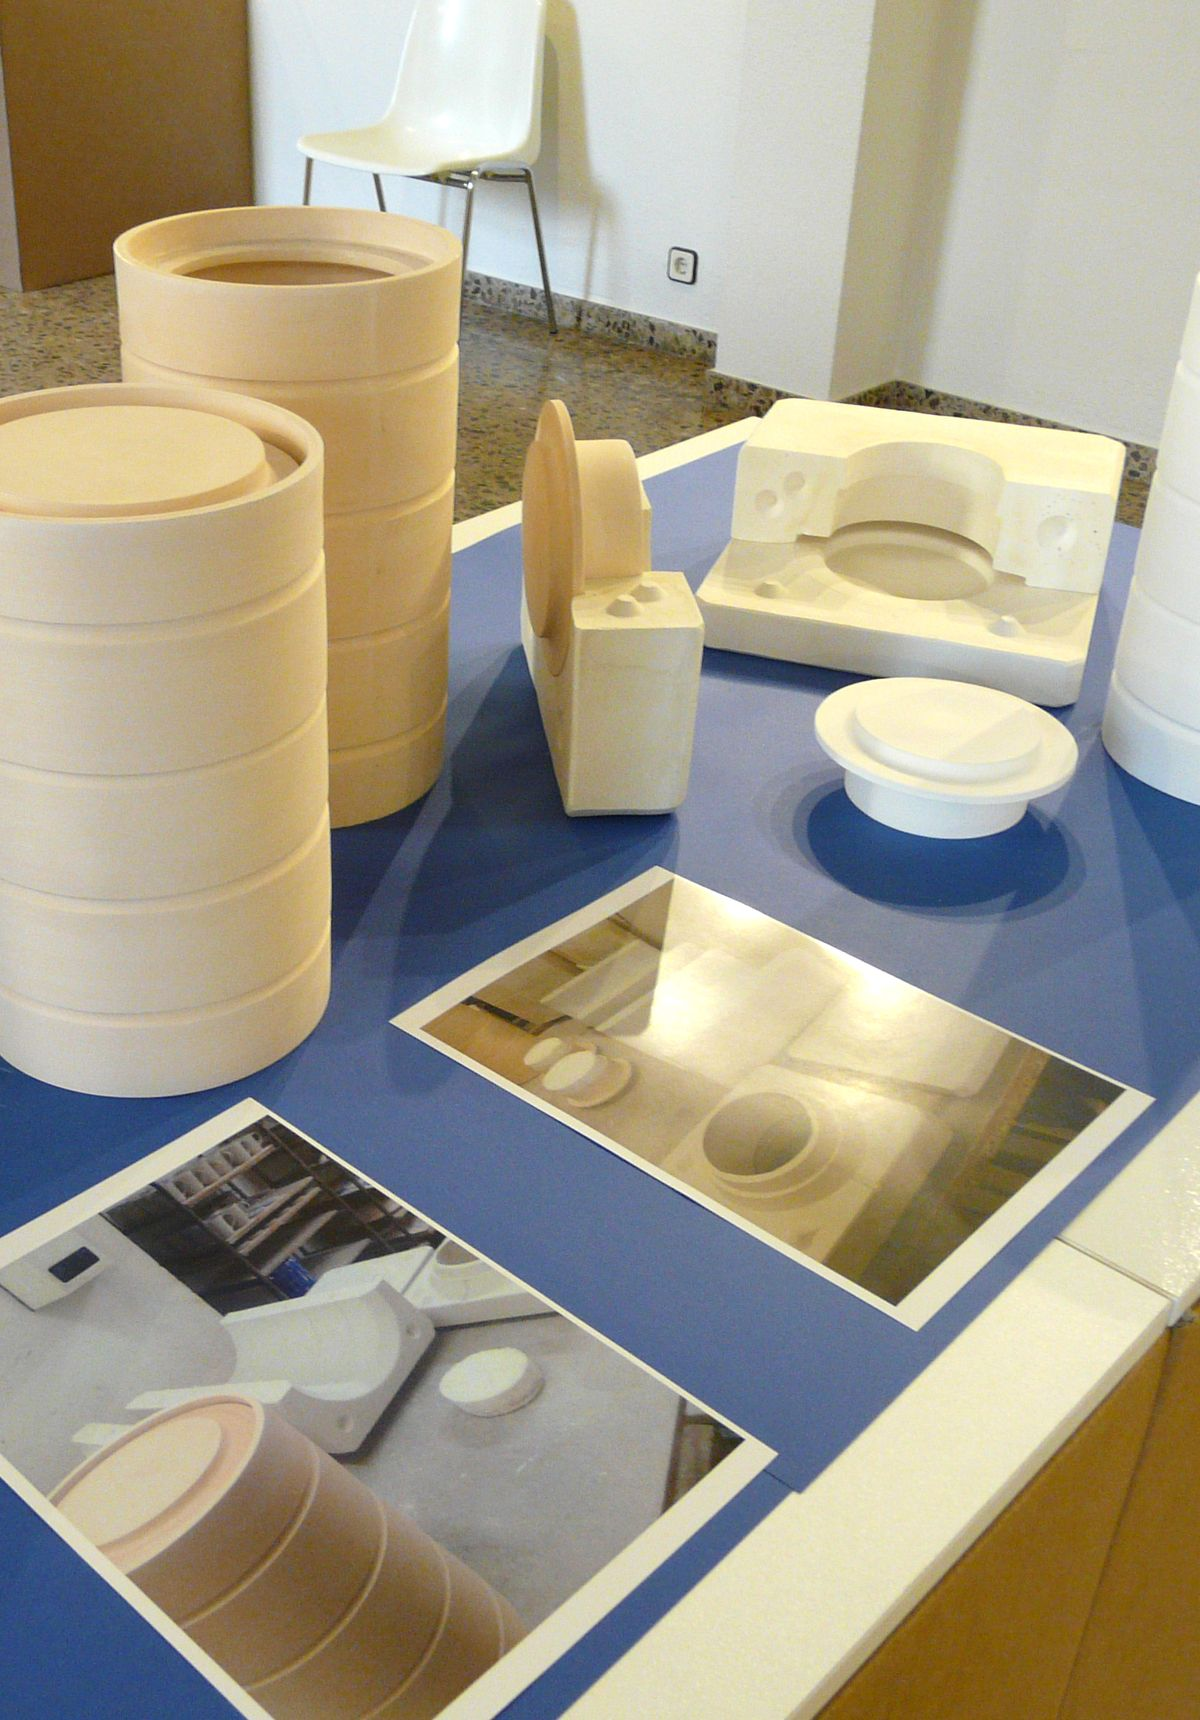 Taller de cerámica en Barcelona: Prototipos cerámicos